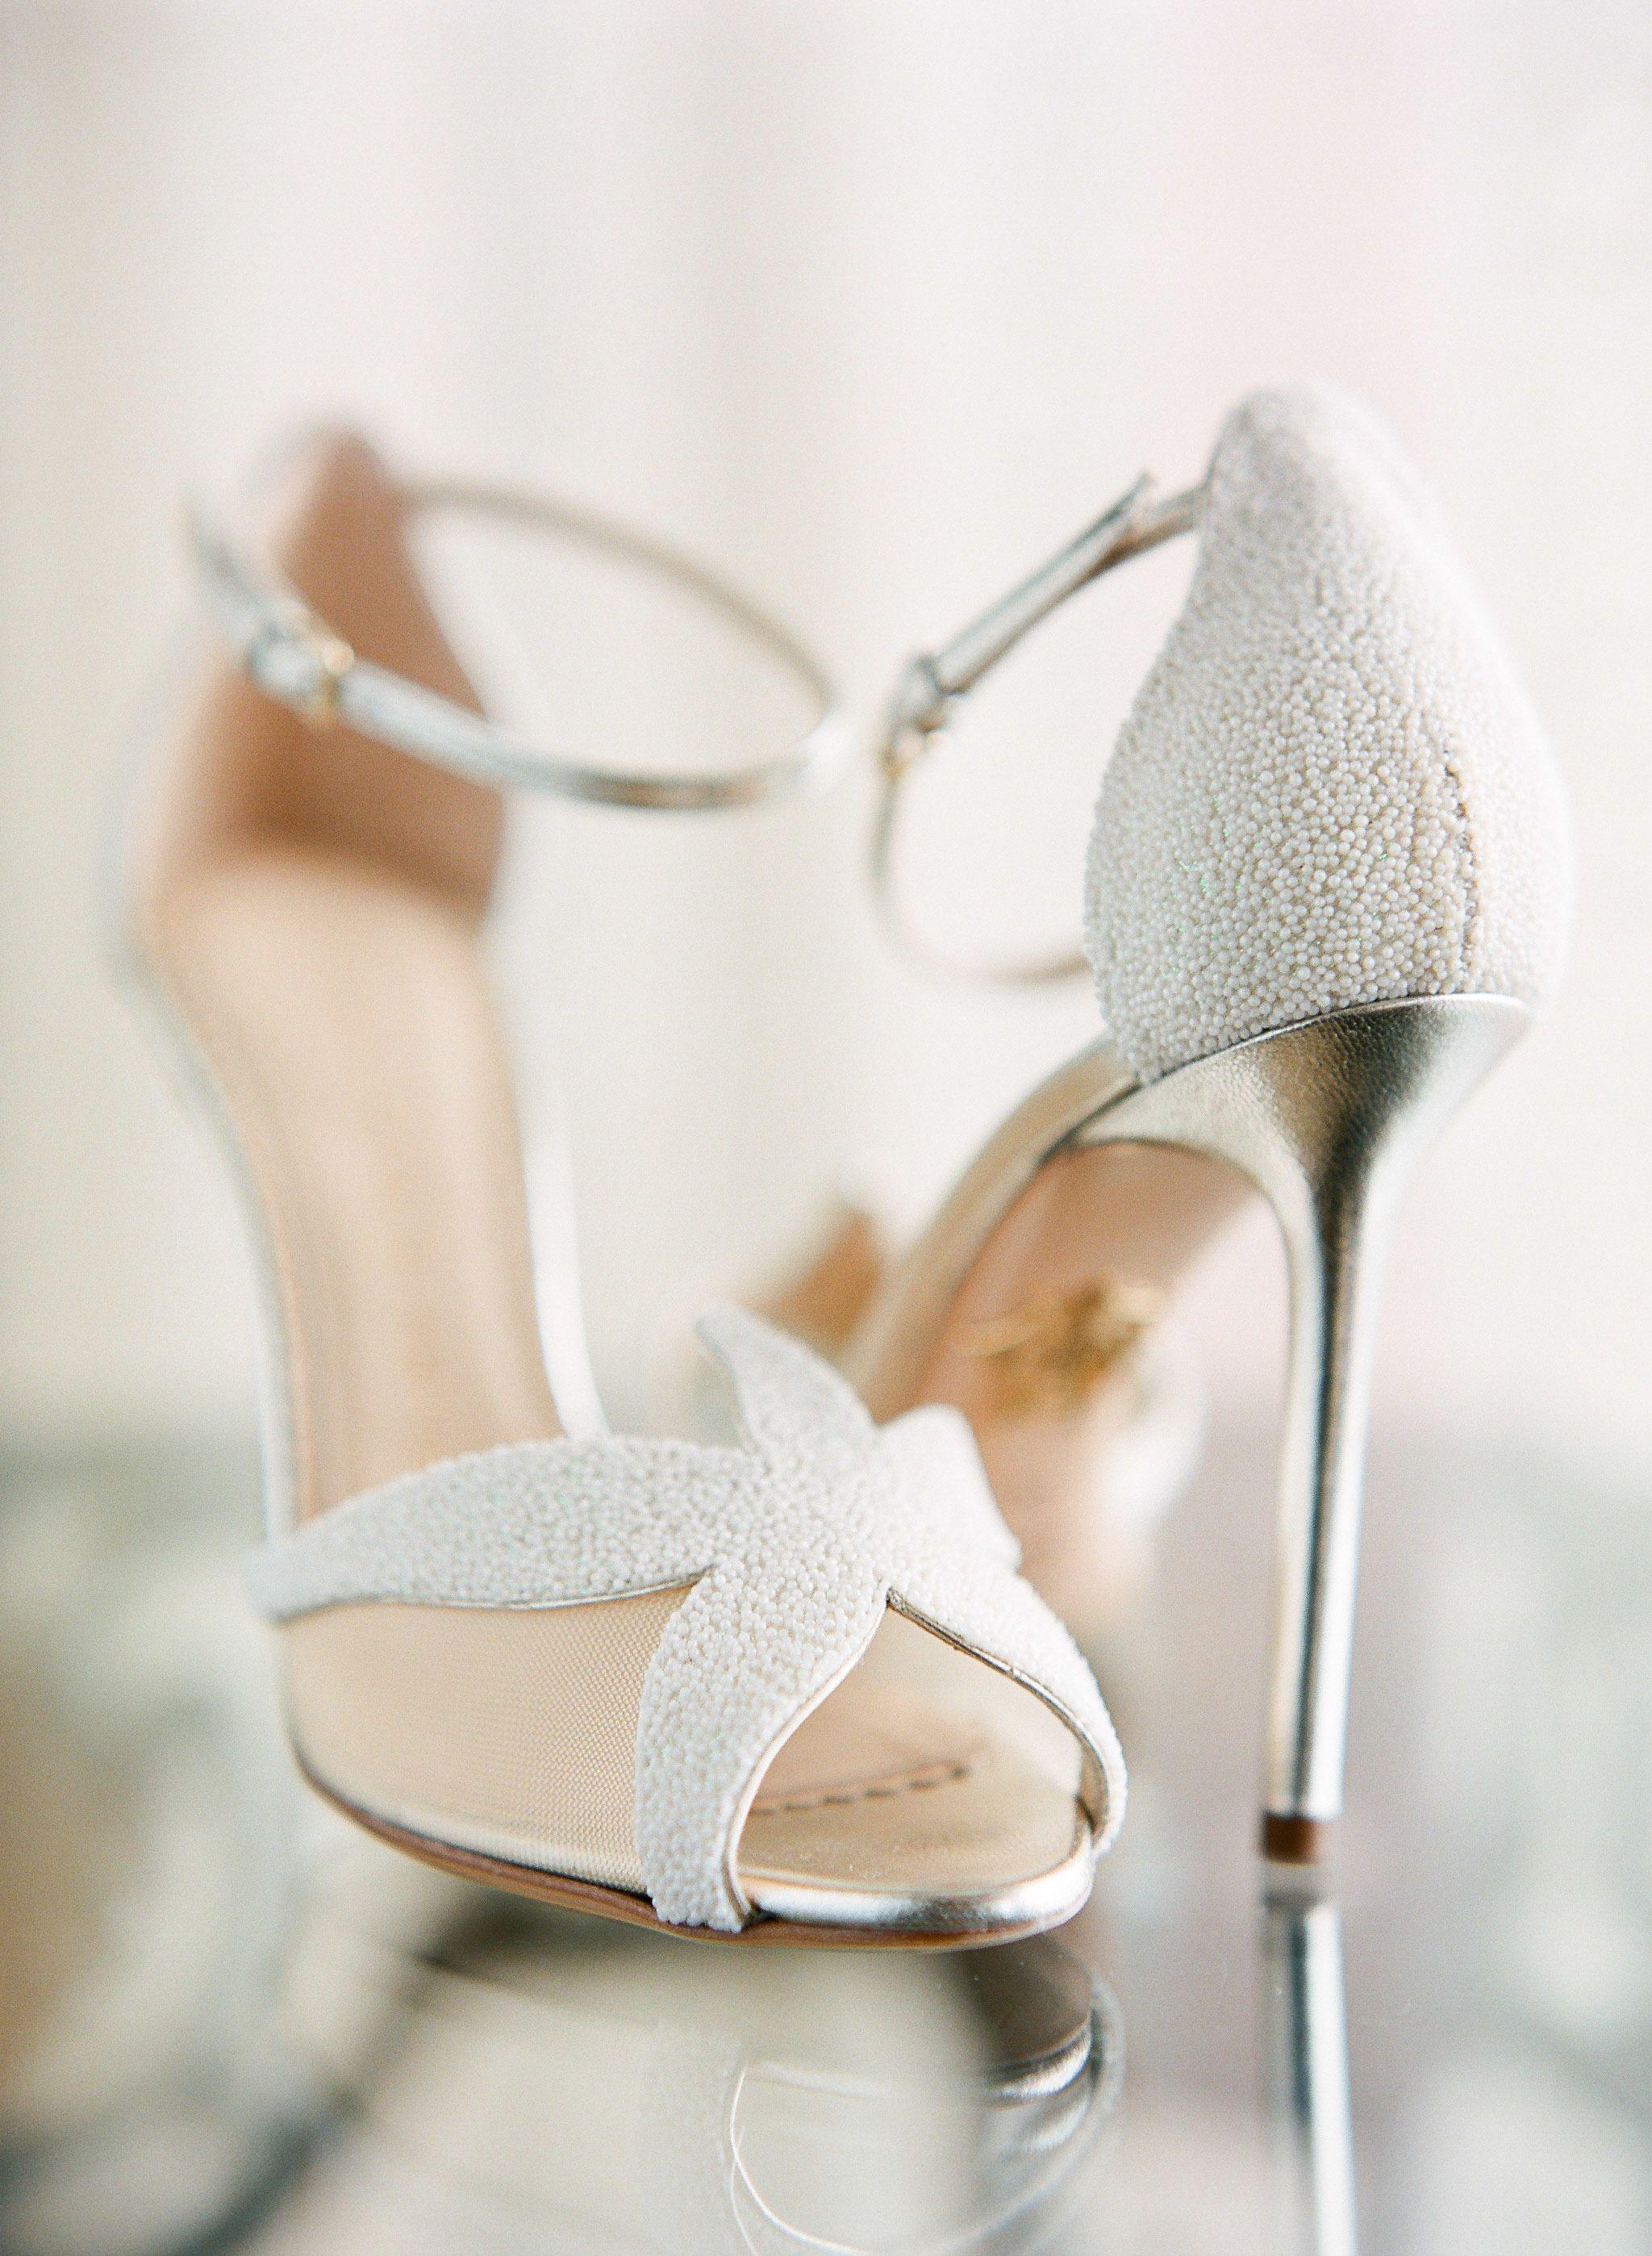 43e1defa4d 20 Impresionantes zapatos de novia que parecen salidos de un cuento de hadas